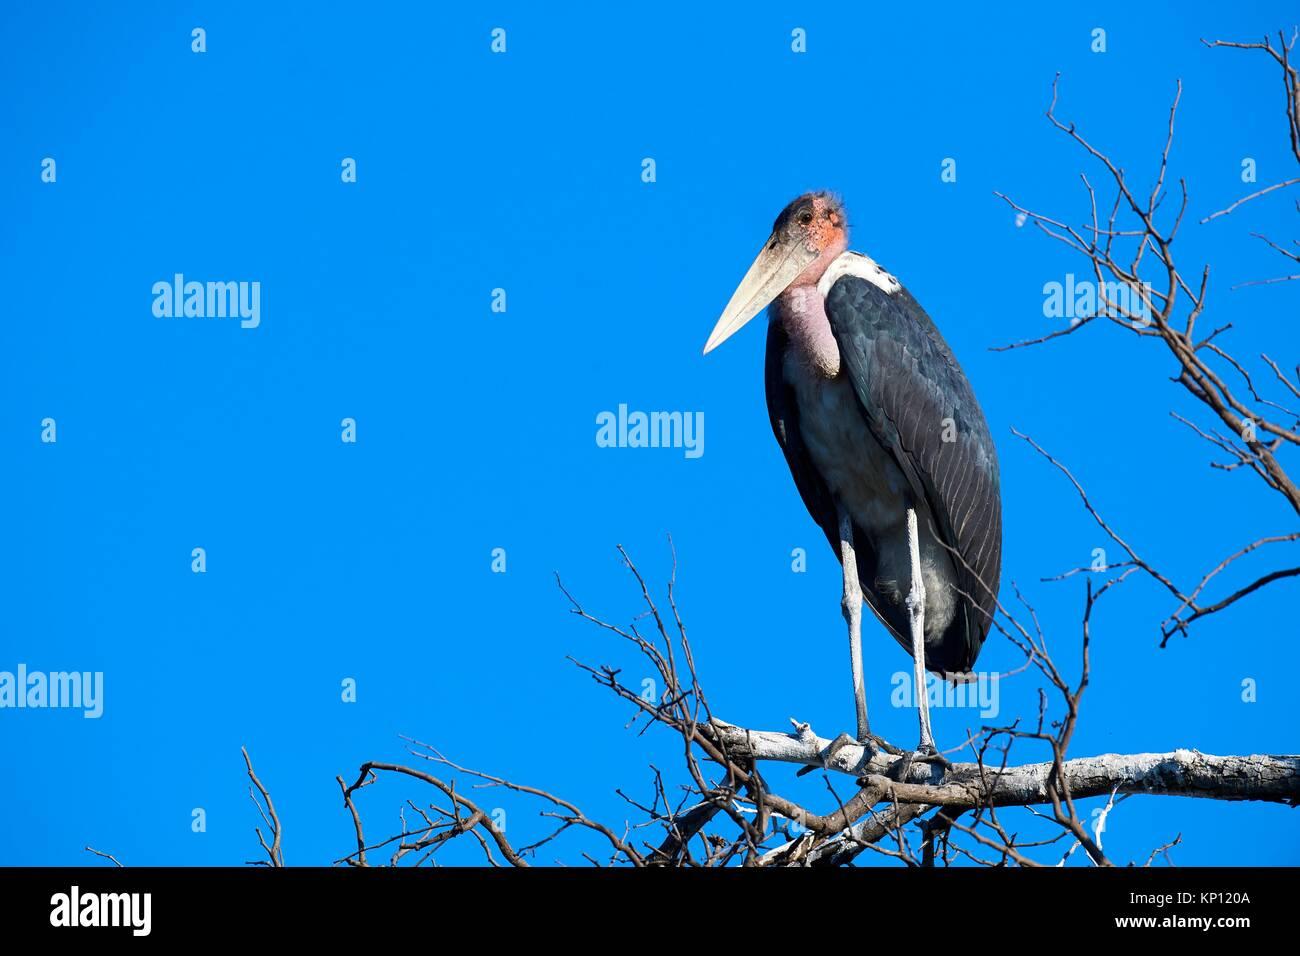 Marabou stork (Milvus aegyptius) perched on branch. Moremi National Park, Okavango delta, Botswana, Southern Africa. - Stock Image